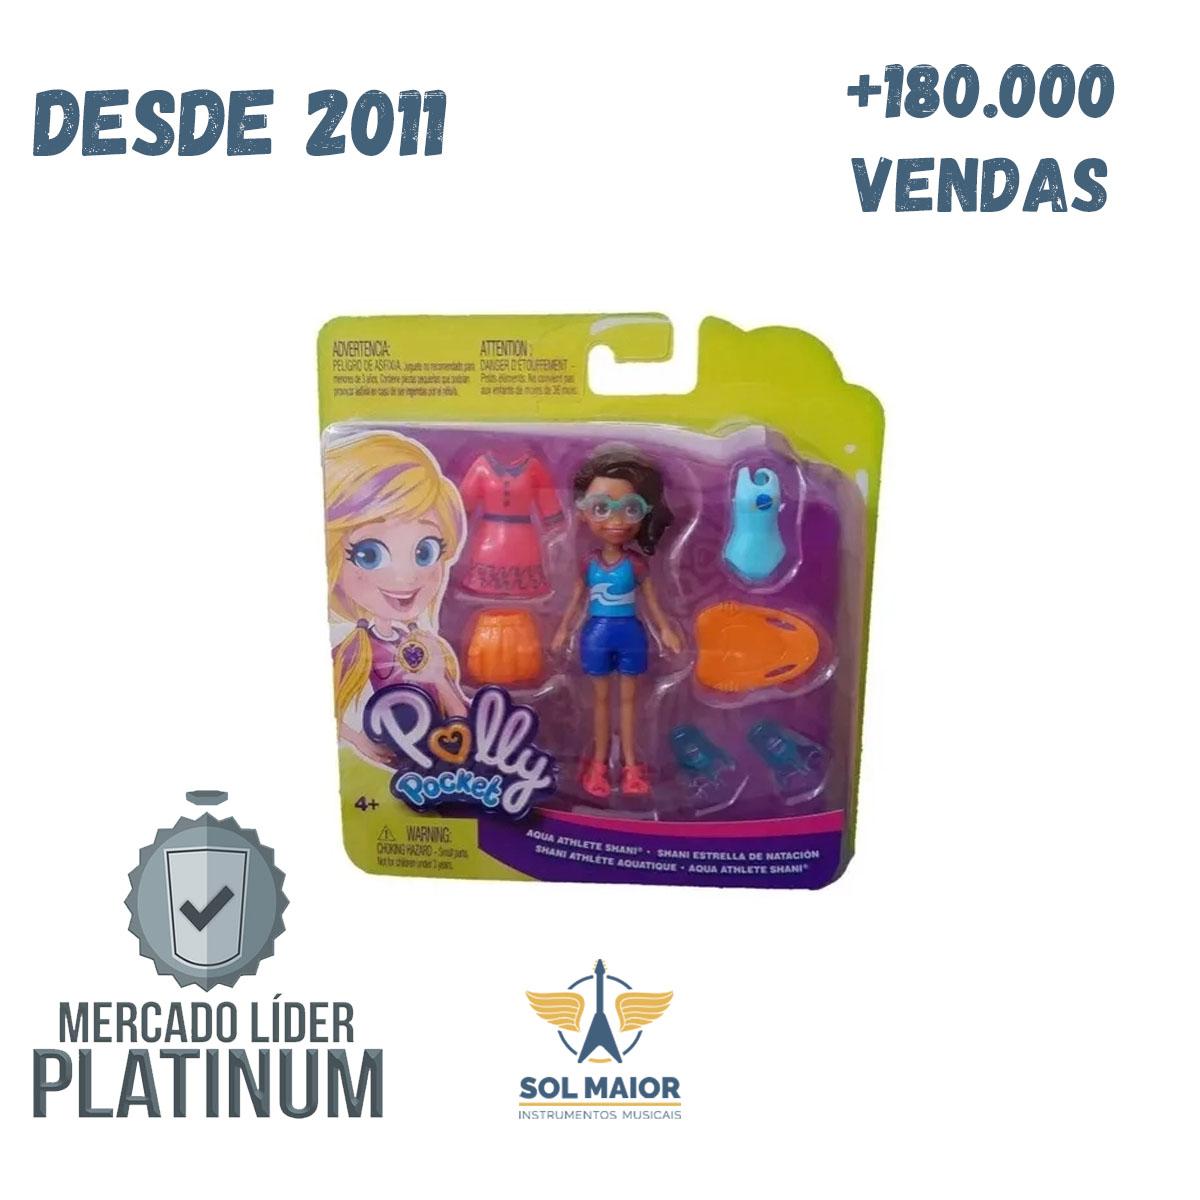 Polly Pocket Boneca Atleta Aquática - GDL97 Mattel